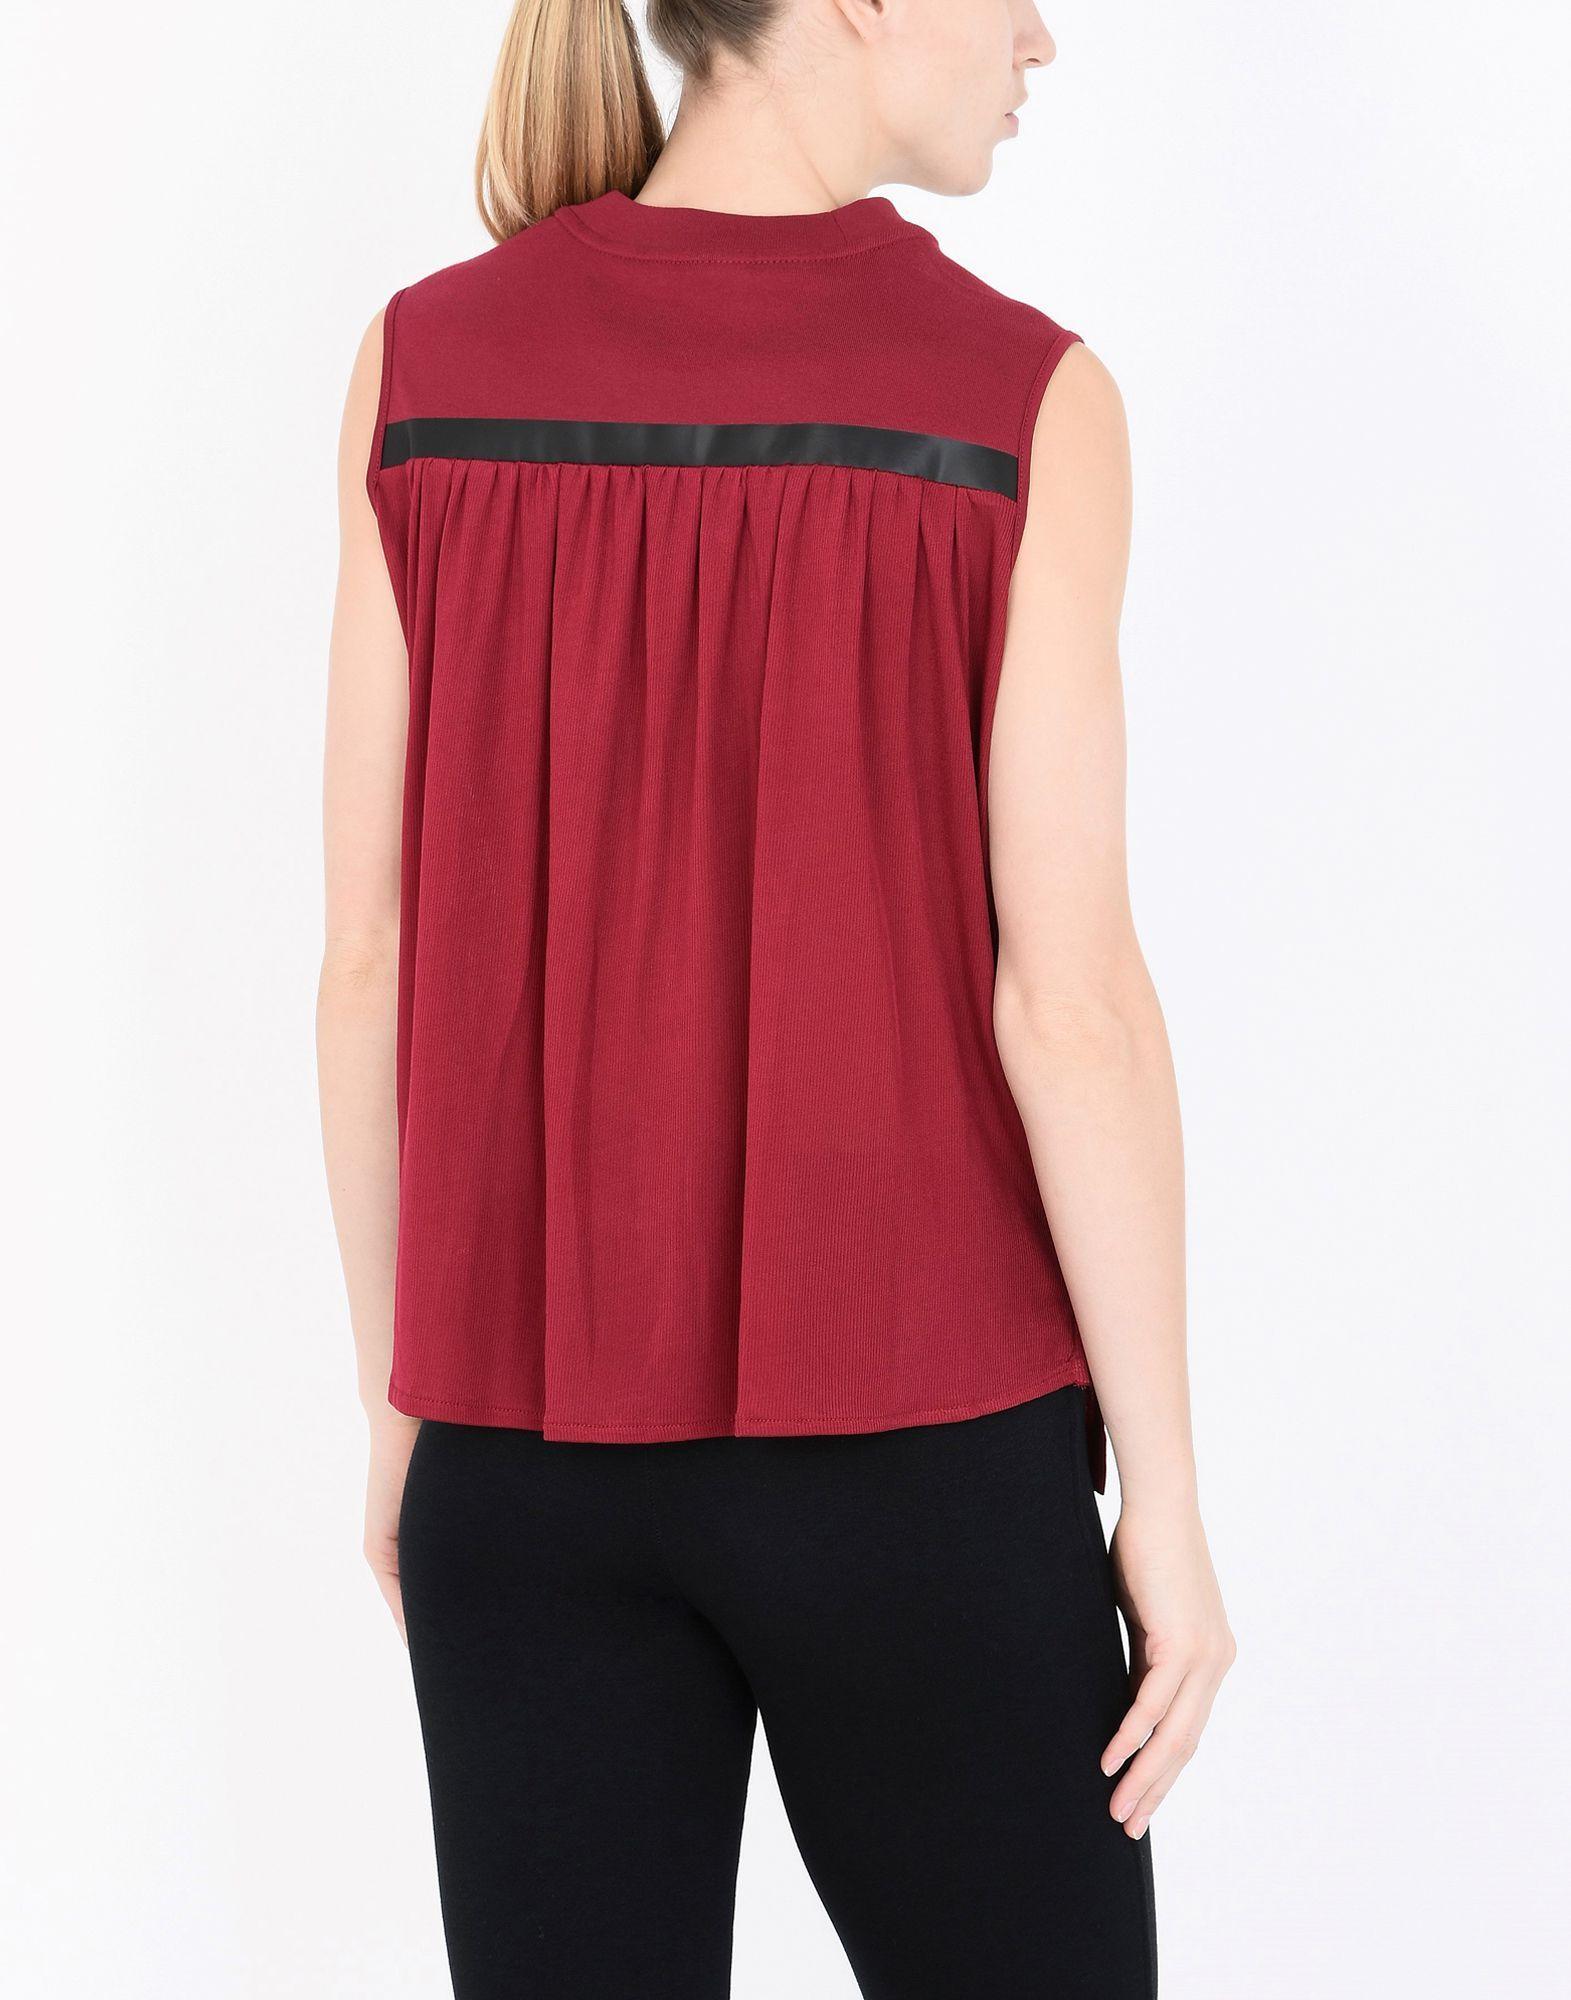 Nike Garnet Cotton Top